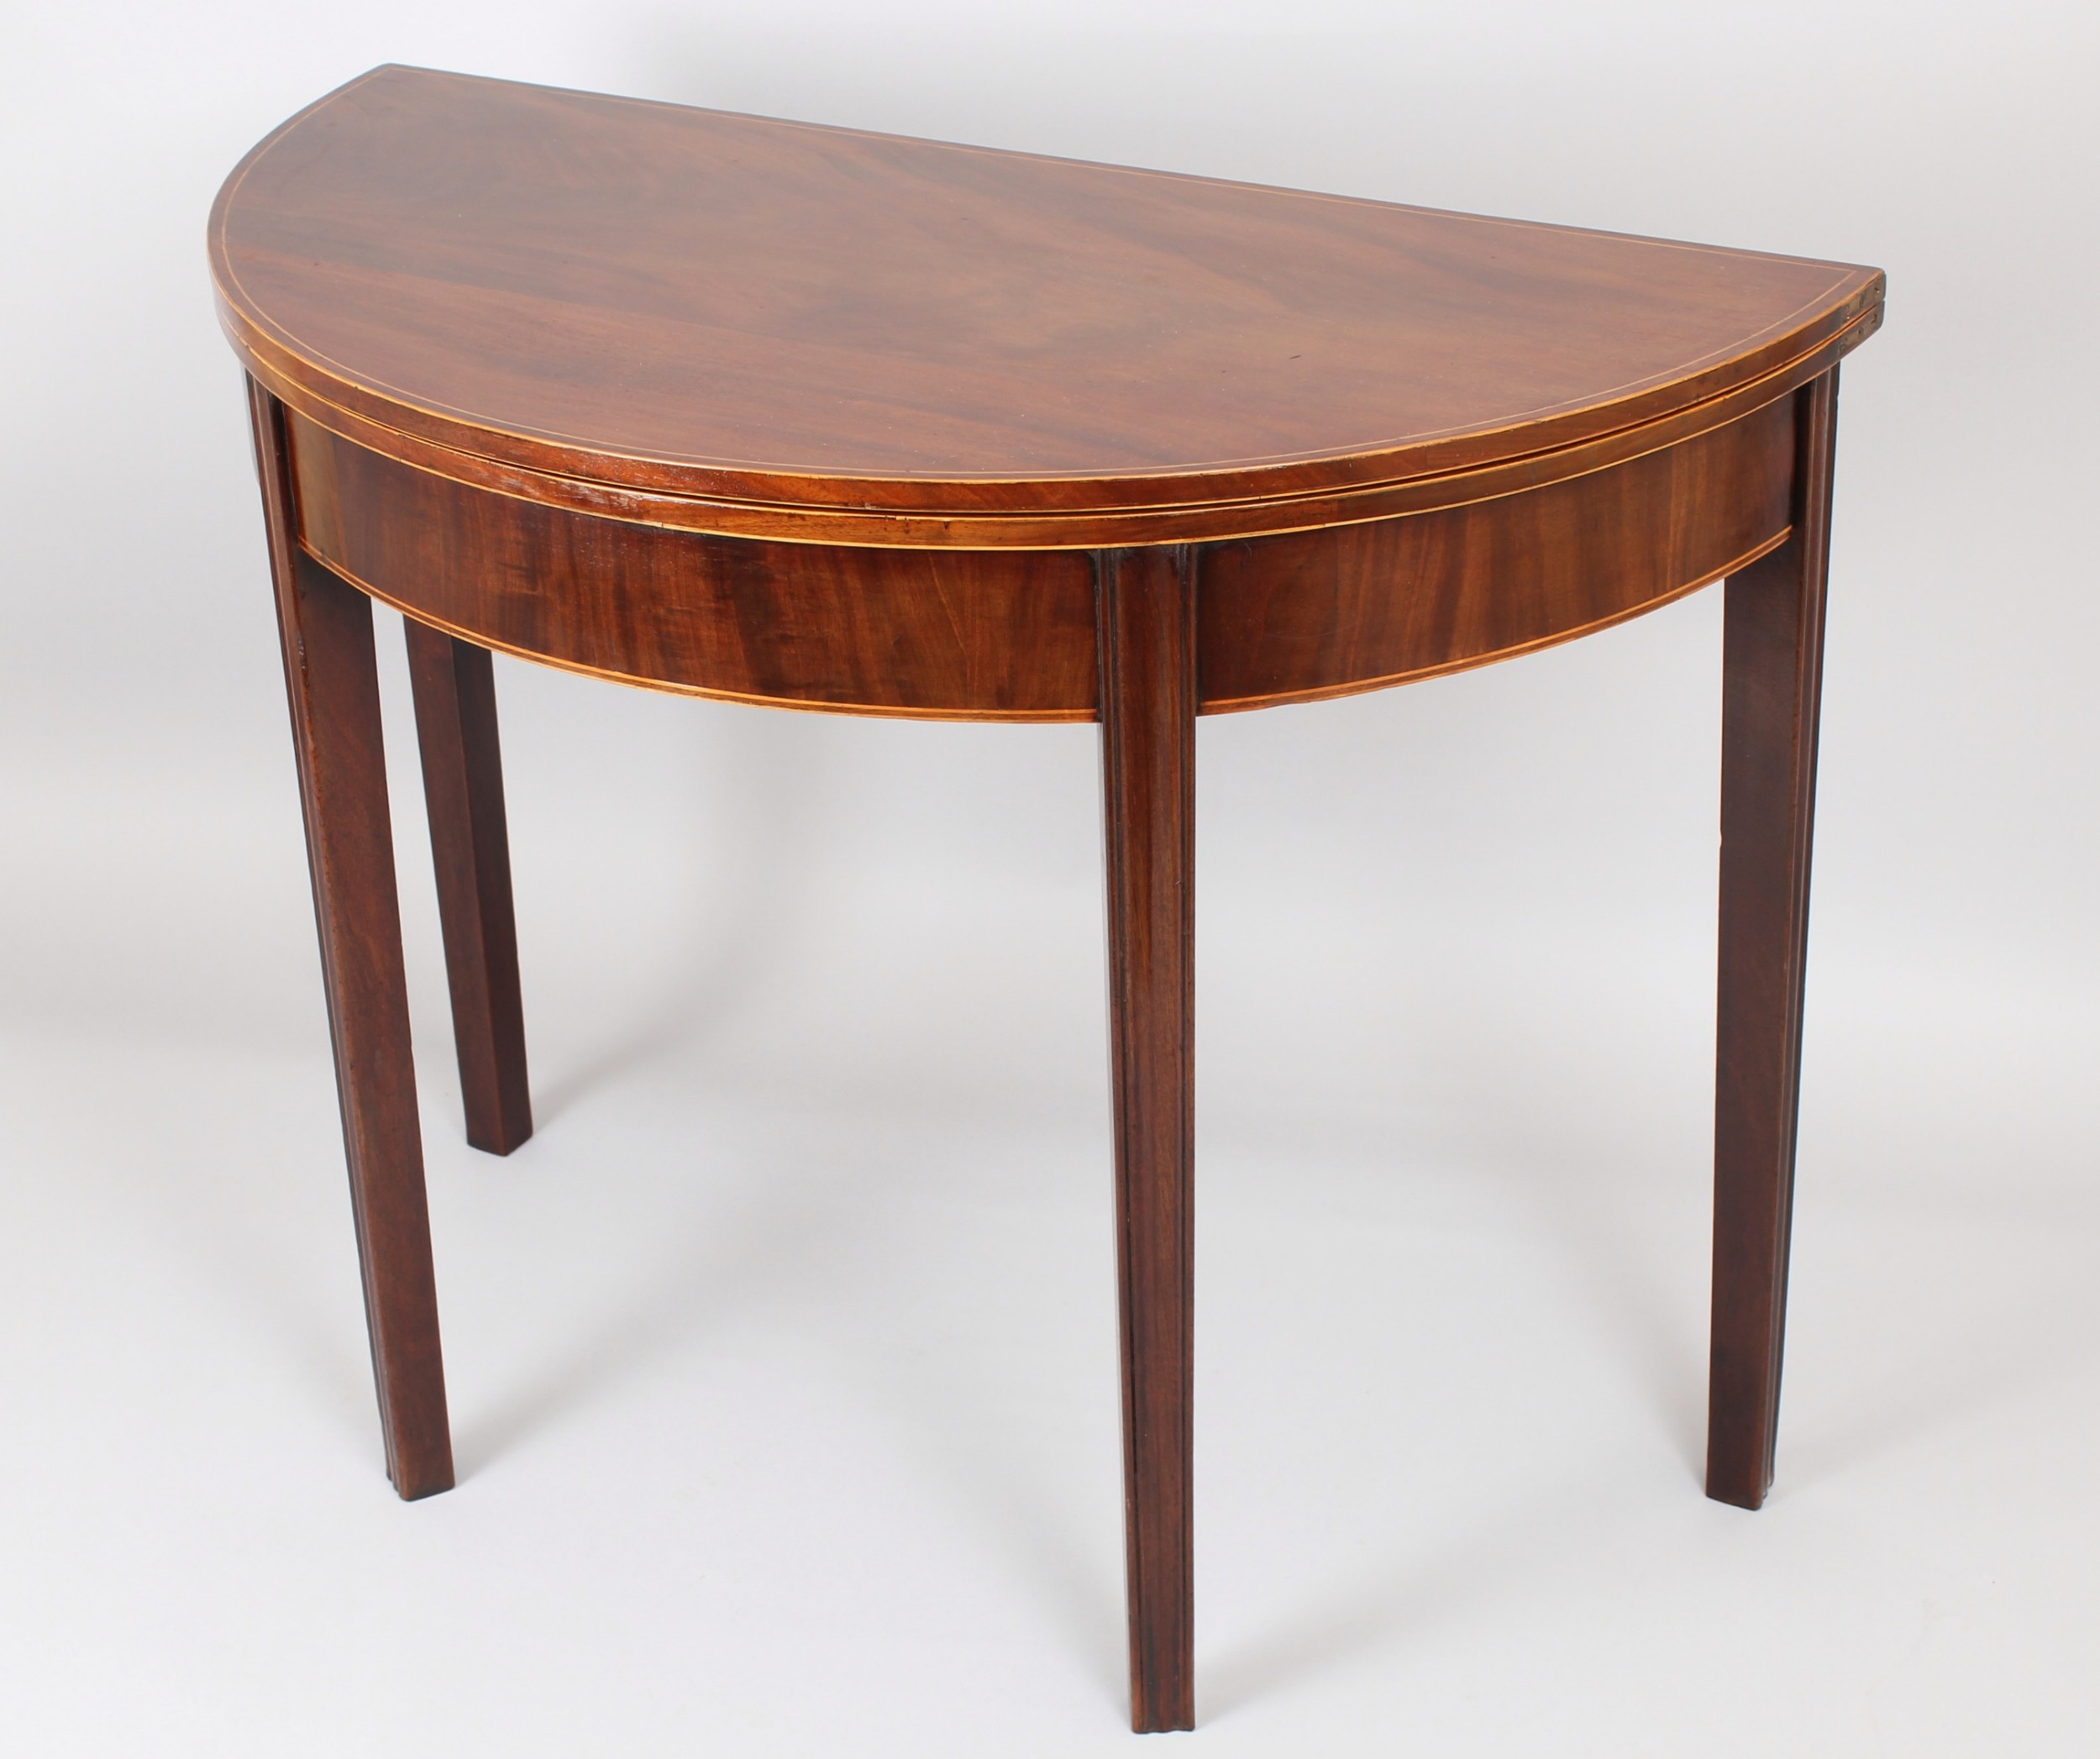 george iii period mahogany semicircular tea table